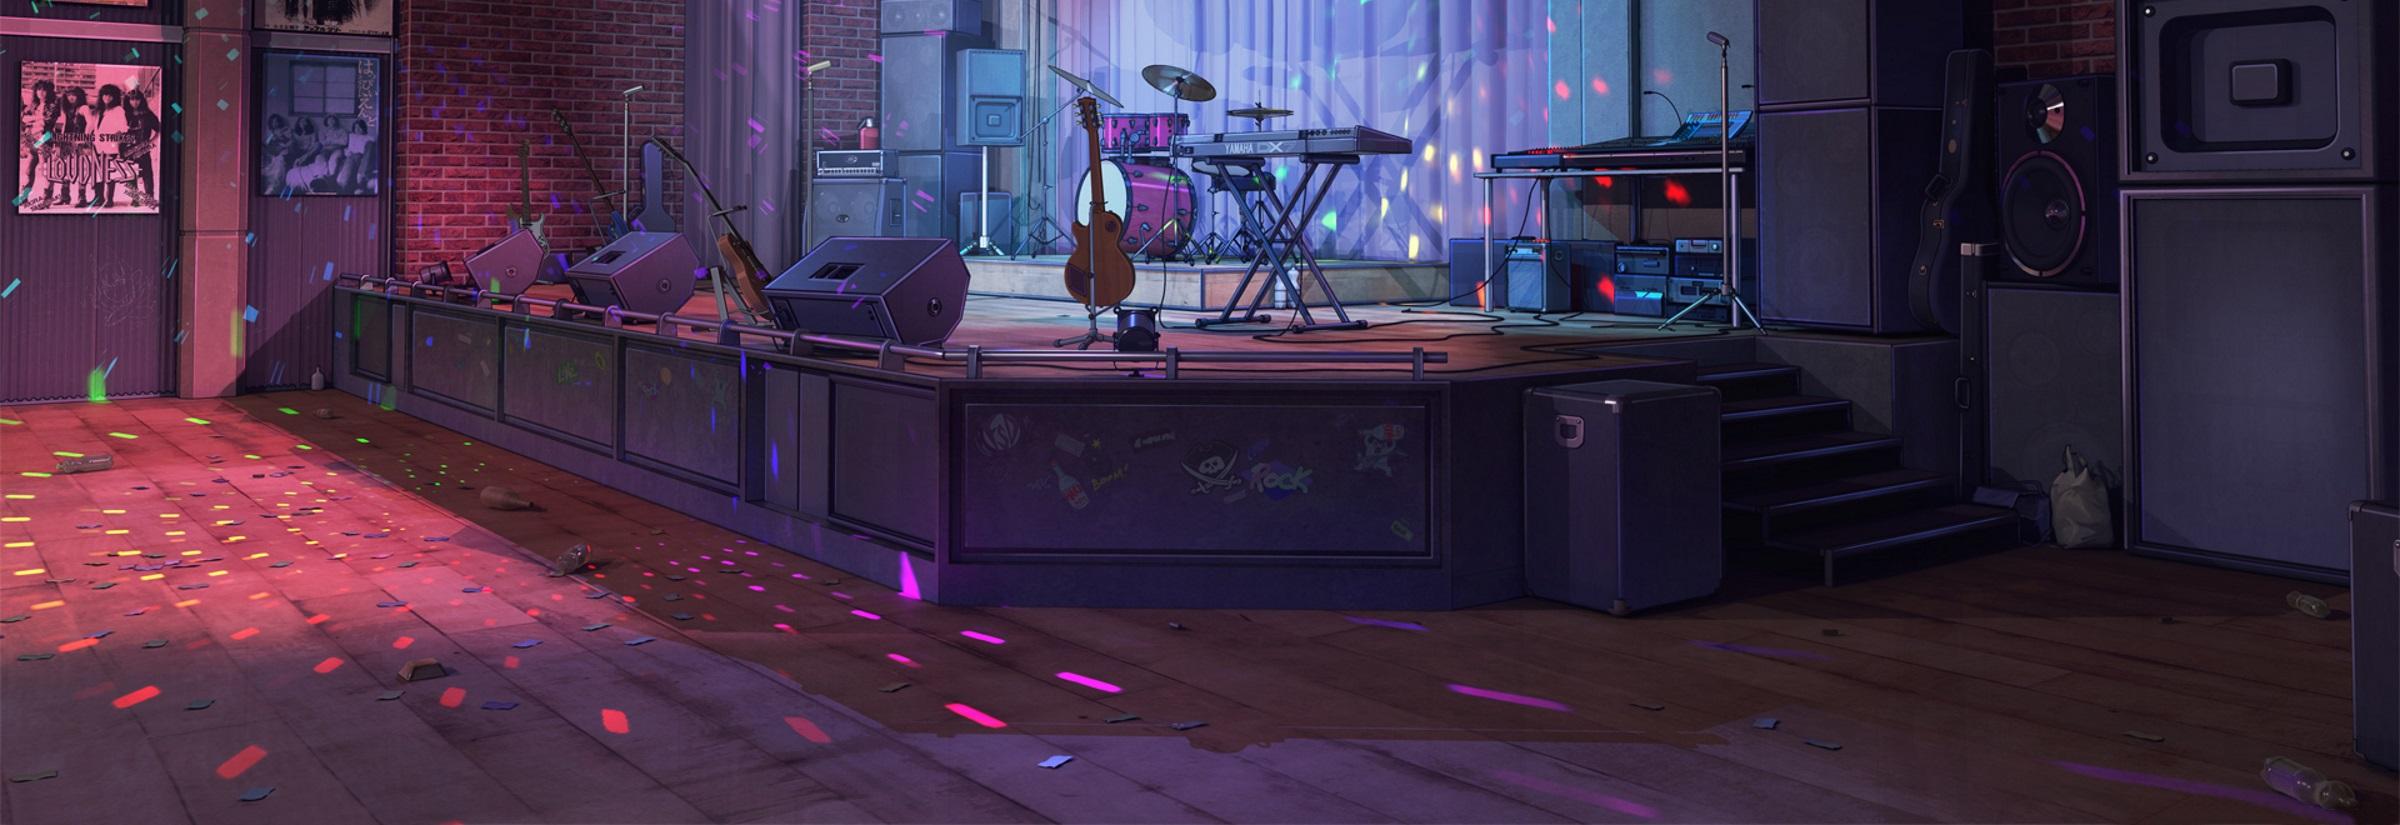 XL Background - Concert Hall 01.jpg